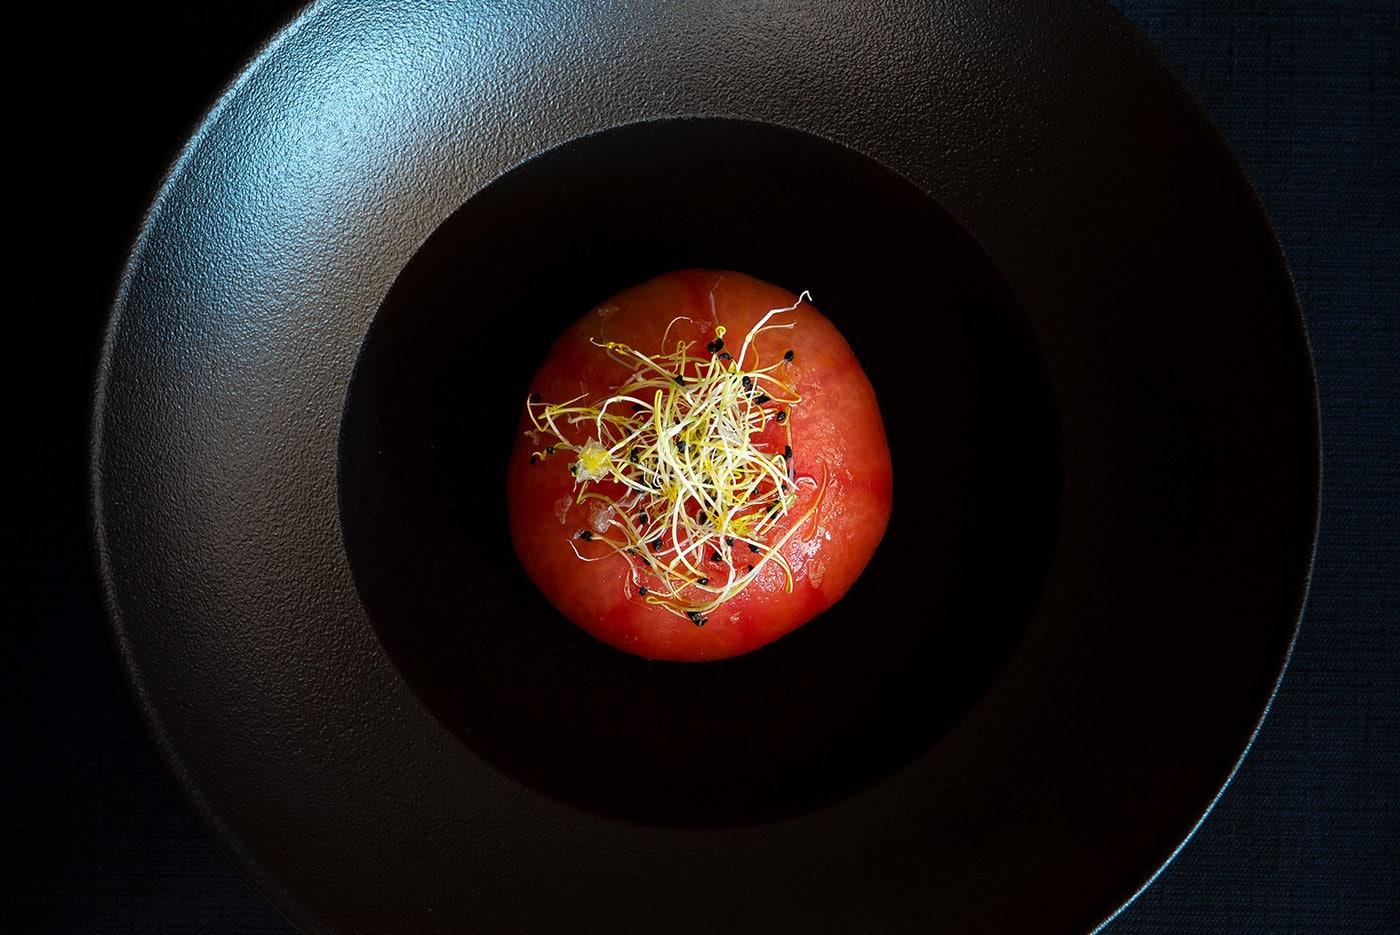 fotografía-gastronómica-hoteles-panoramios-por-adolfo-gosalvez-gastronomía